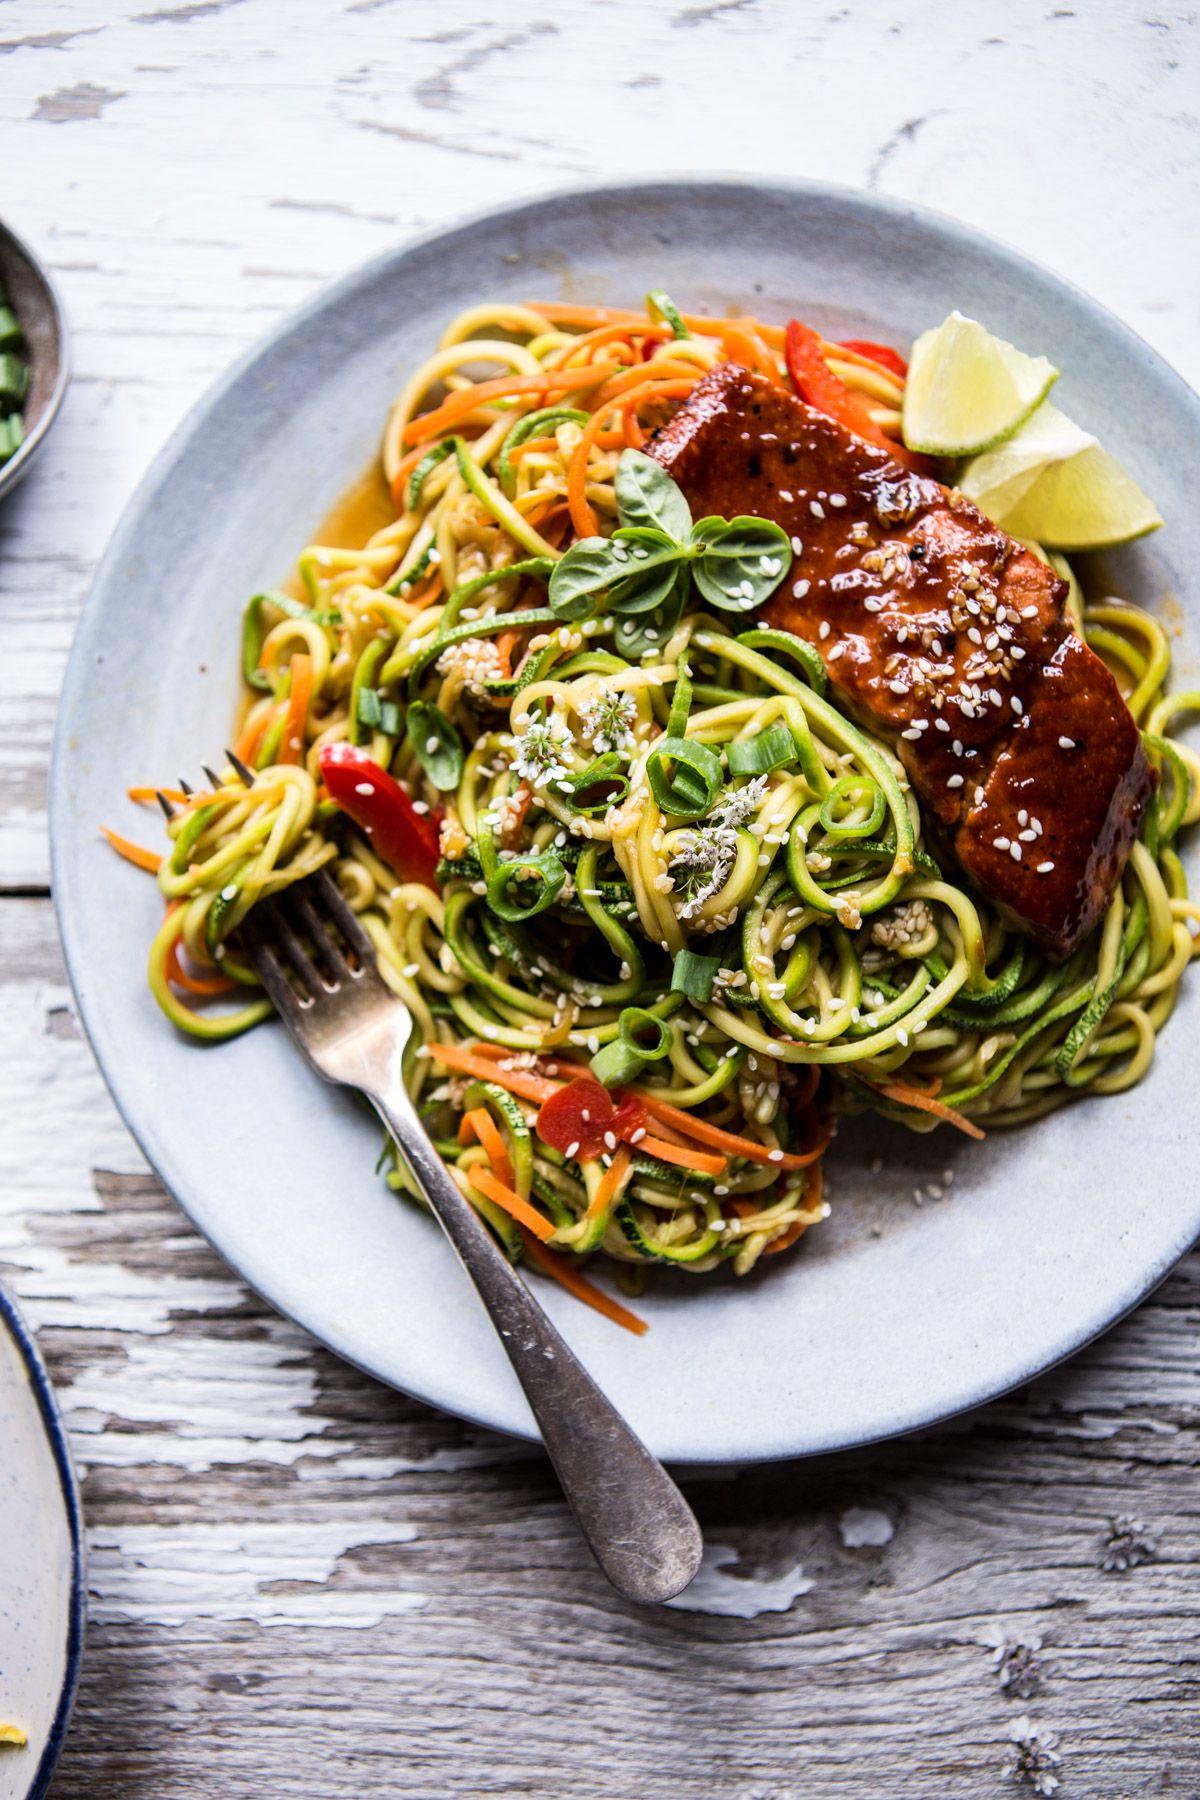 Hoisin Salmon With Zucchini Slaw Recipe Healthy Recipes Food